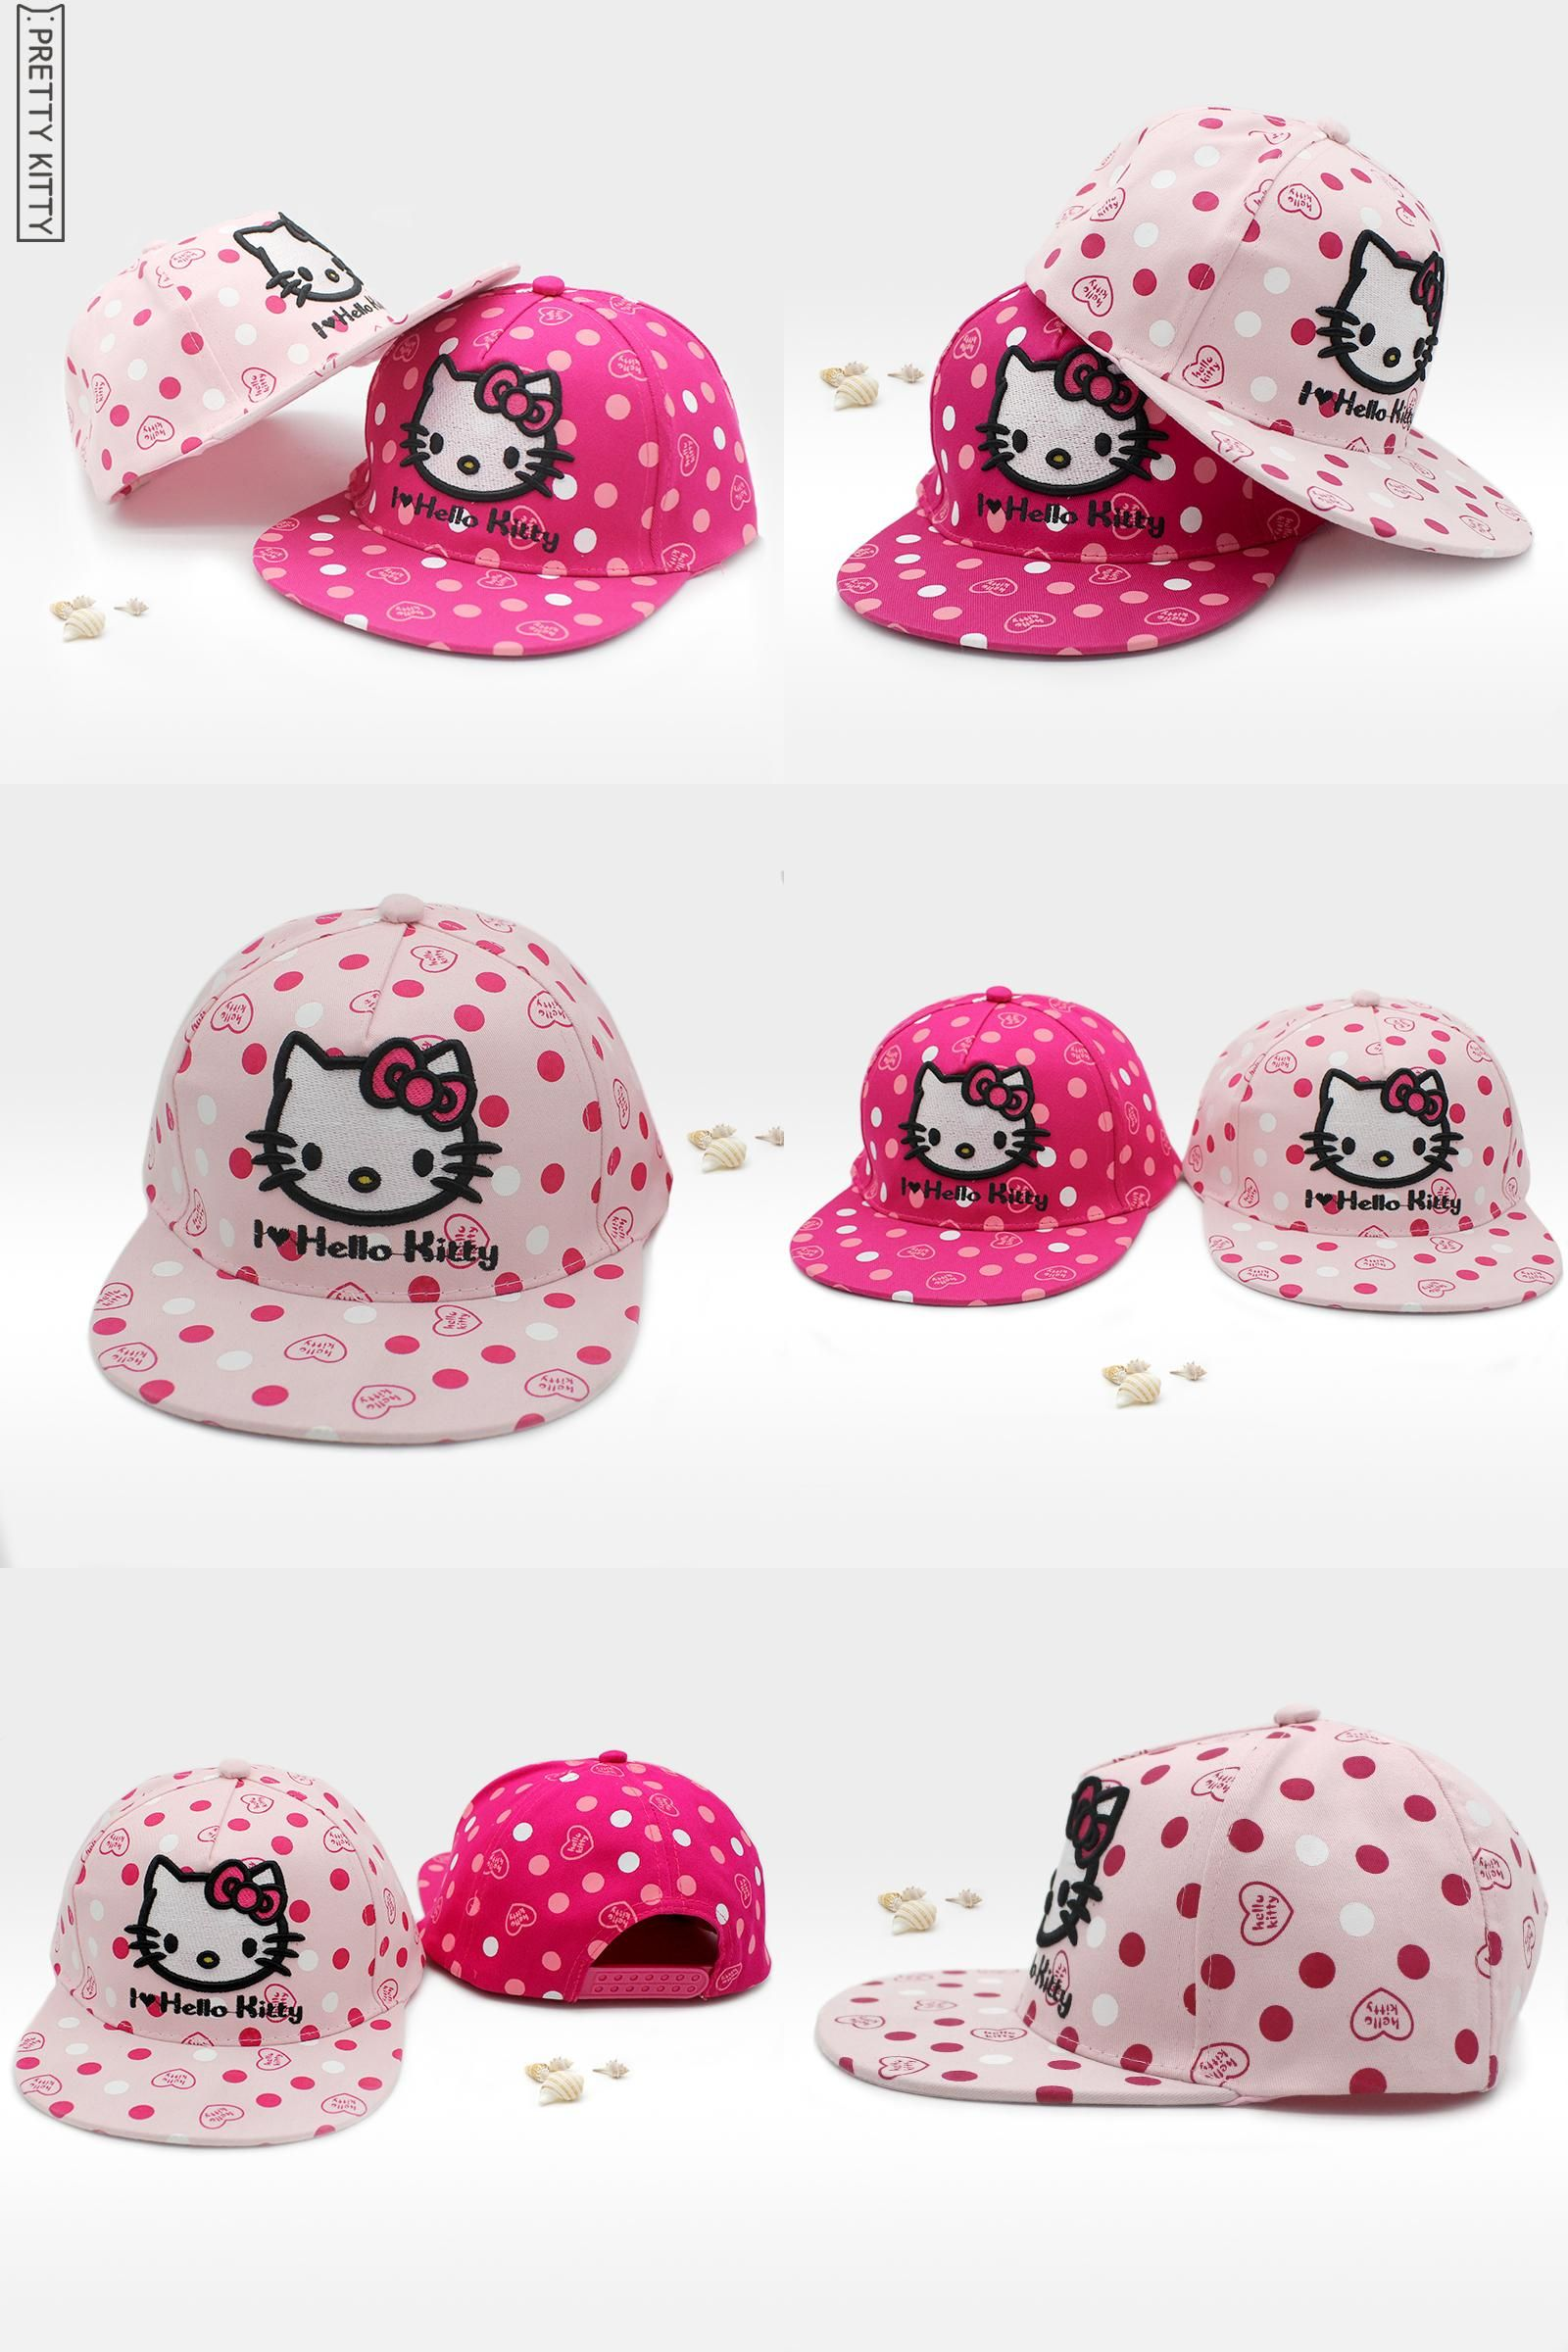 2a7711d74 [Visit to Buy] PRETTY KITTY Children Baseball Caps Girls Spring Summer Hat  Hello Kitty Sun Hat Baby Kids Cotton Cap for Girls New Fashion  #Advertisement